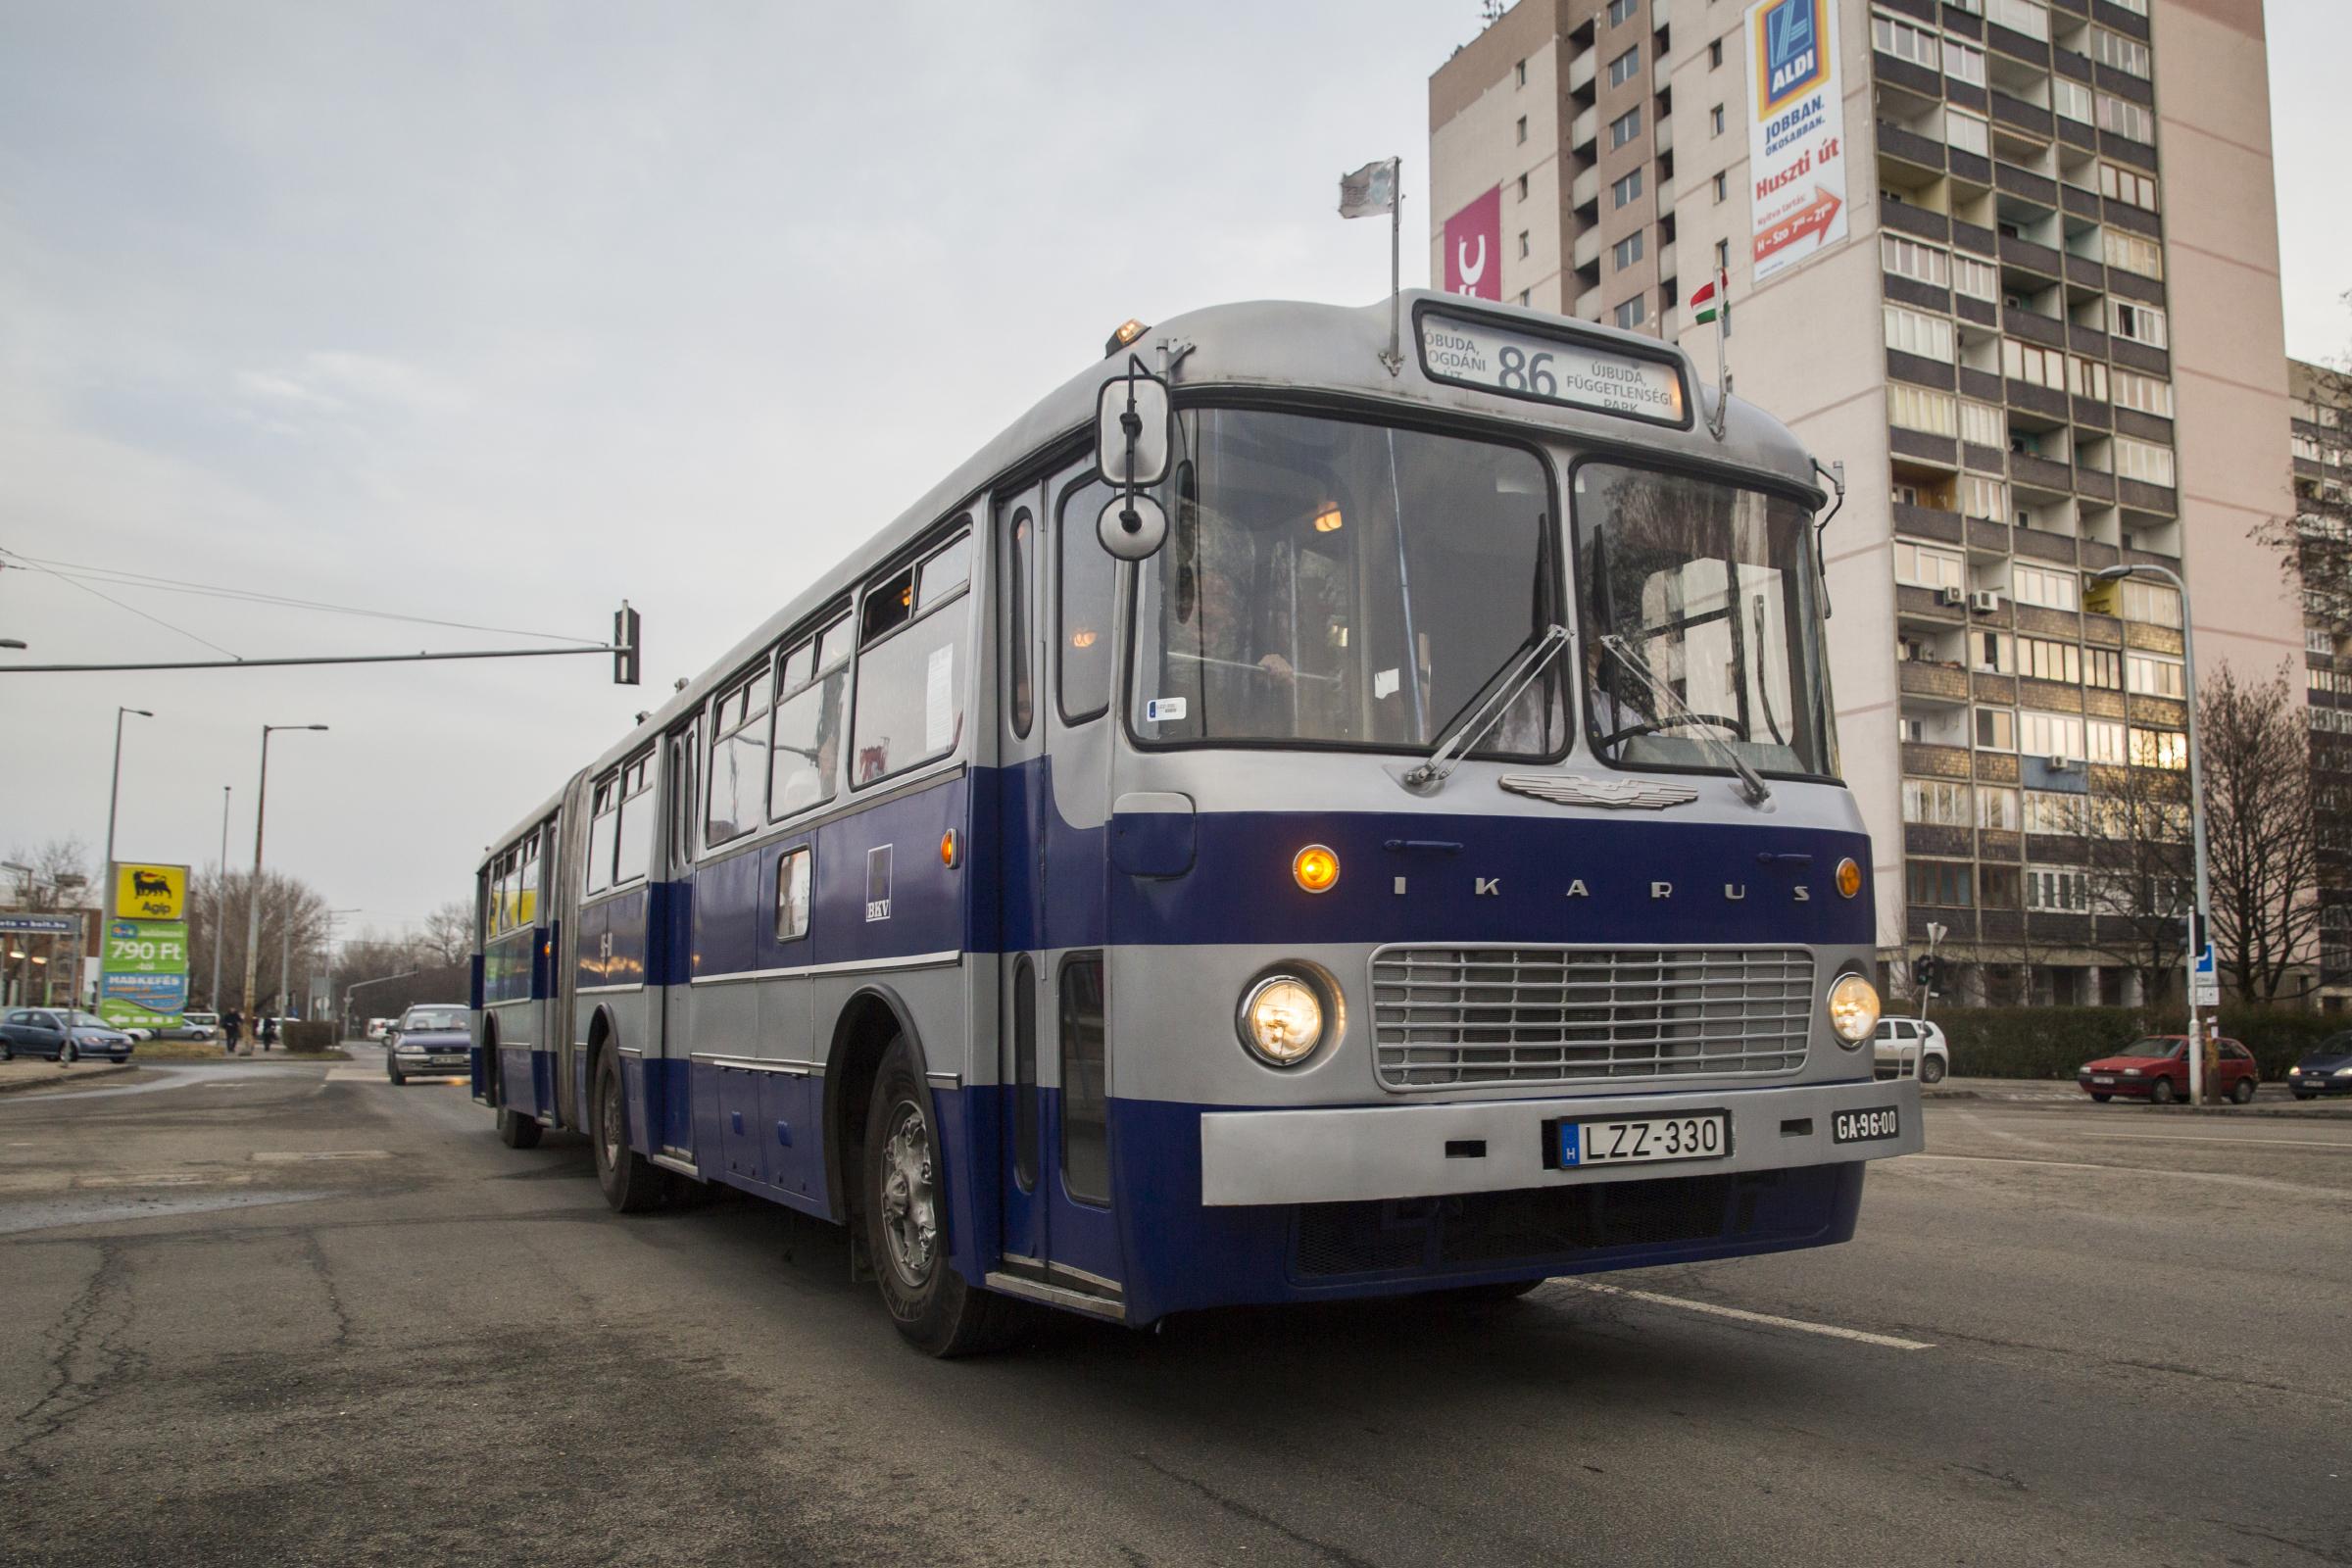 20160115busz-bkk-86-86os13.jpg